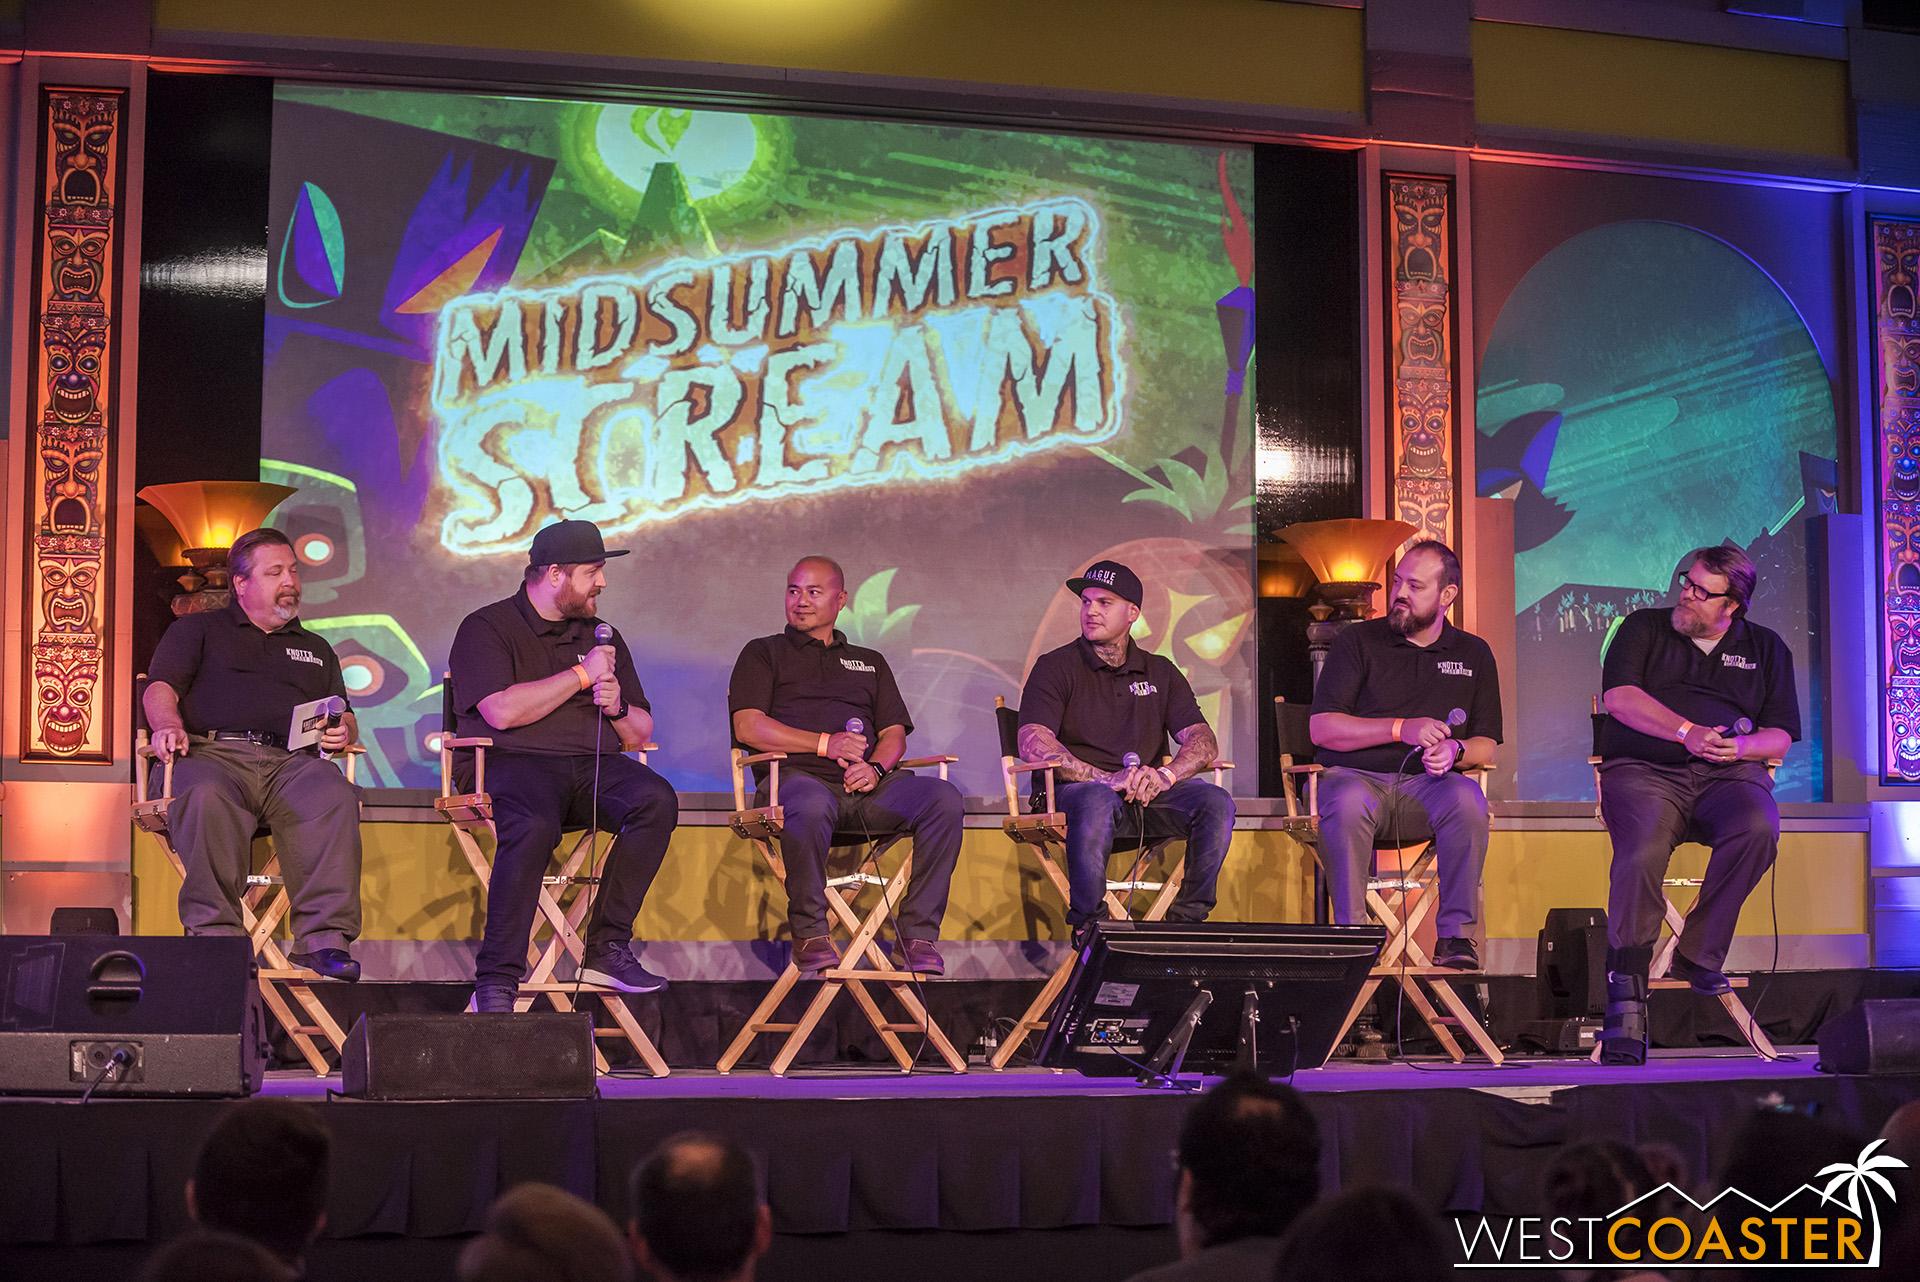 Left to right, Jeff Tucker, Dan Bieranowski, Jon Aspirin, Jon Cooke, Eric Nix, and Ken Parks.